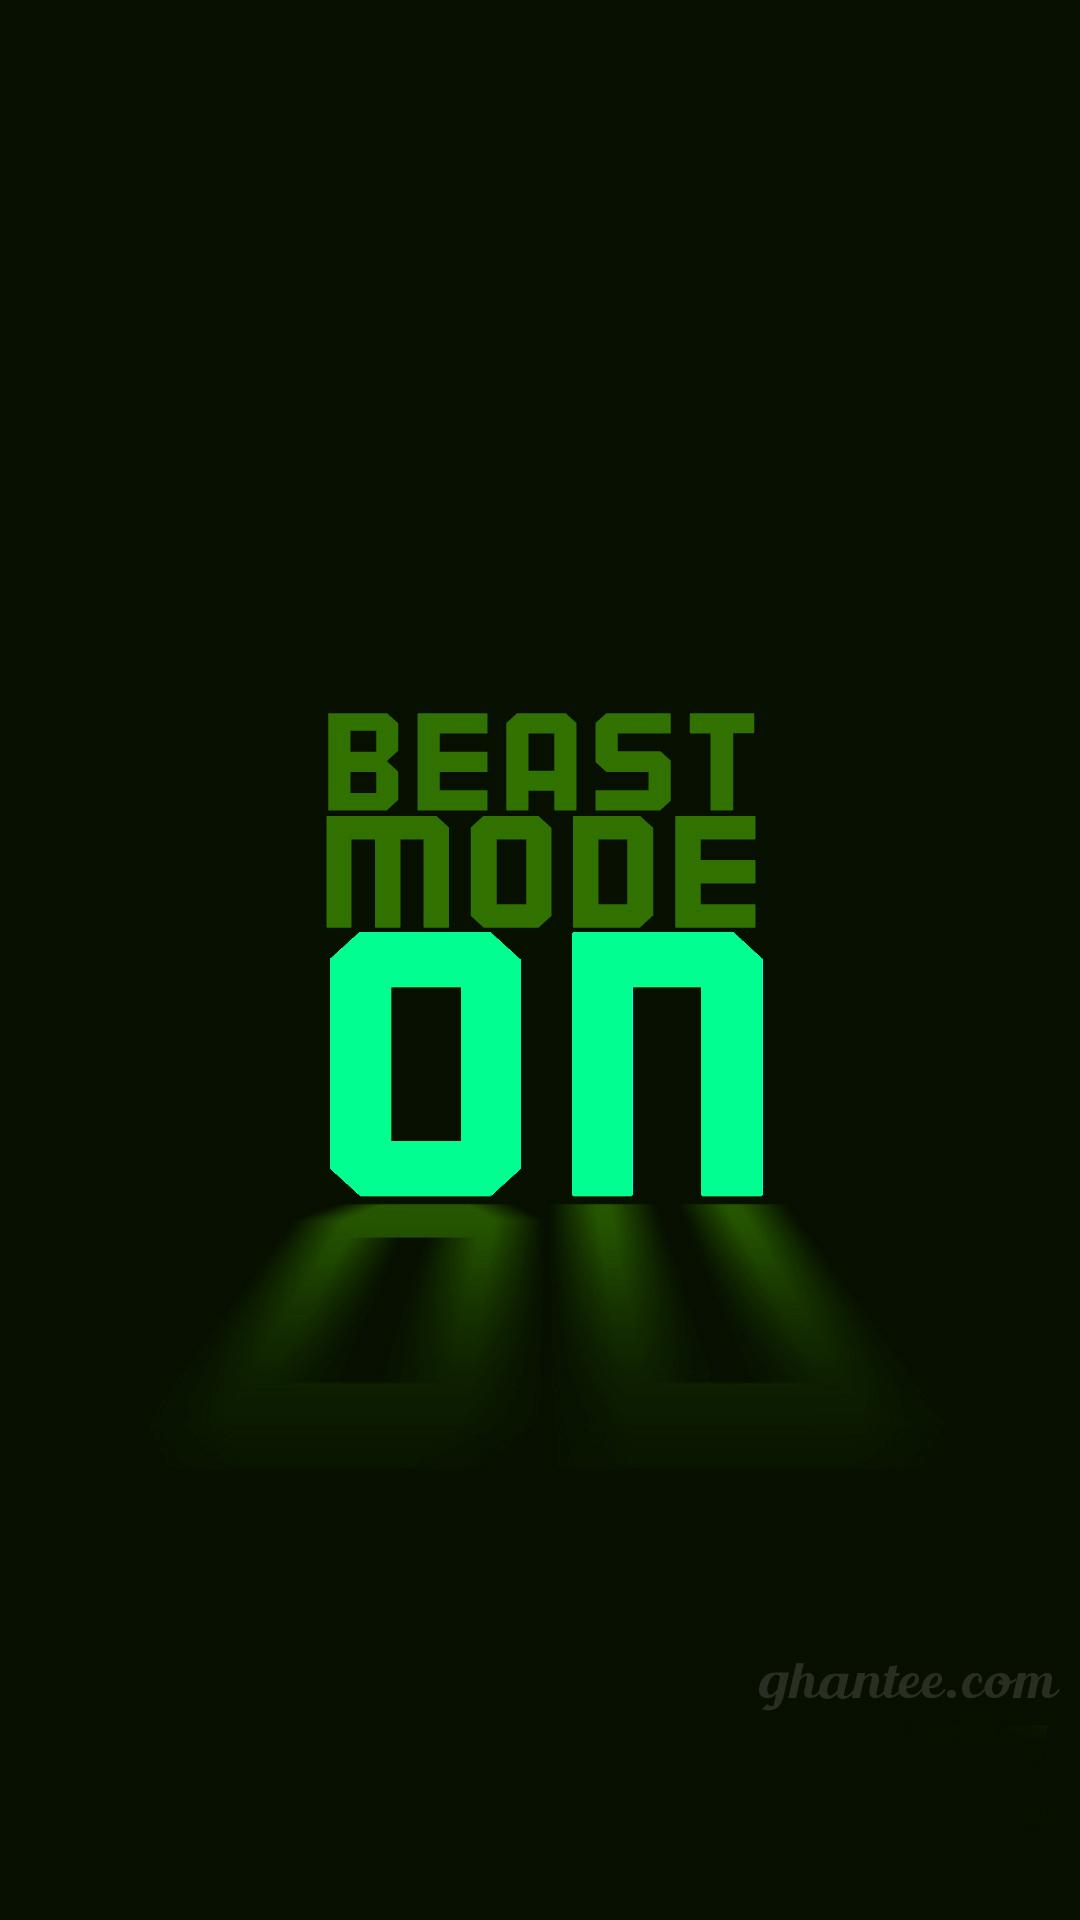 beast mode on hd phone wallpaper